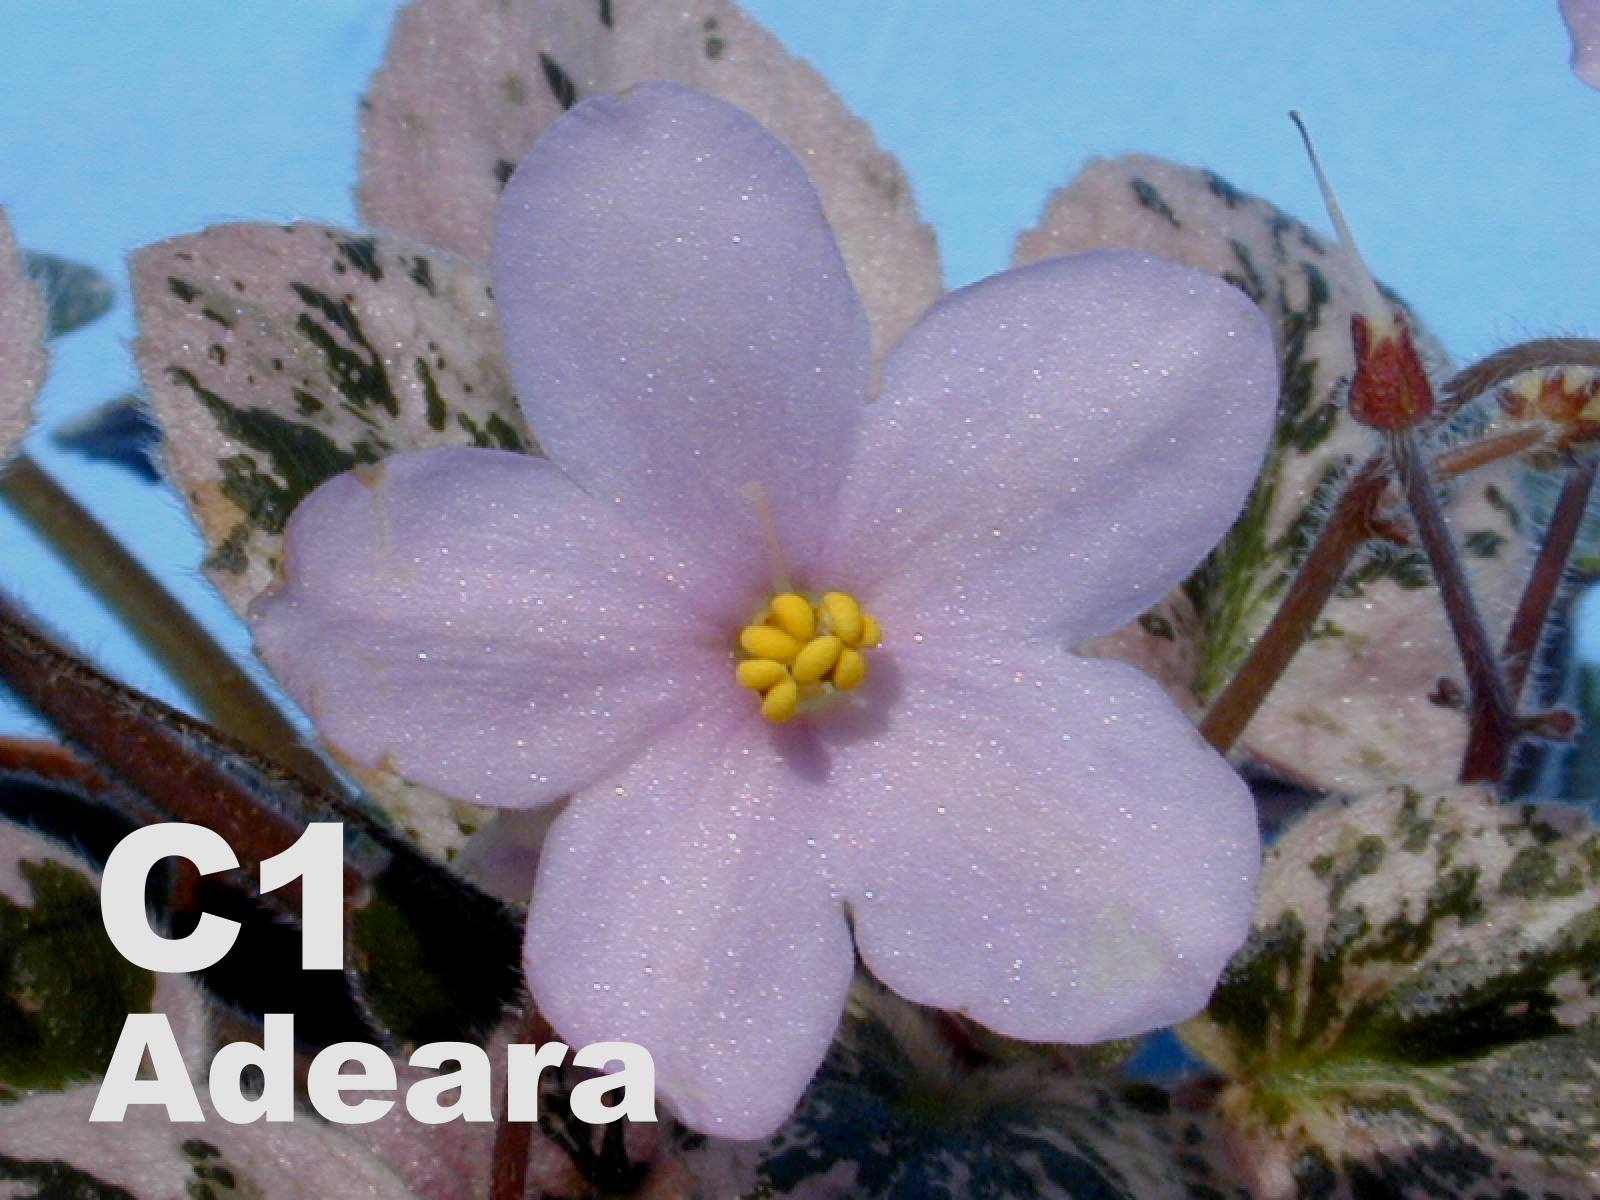 非洲紫羅蘭名錄 | African Violets Catalogue - C系列 C1